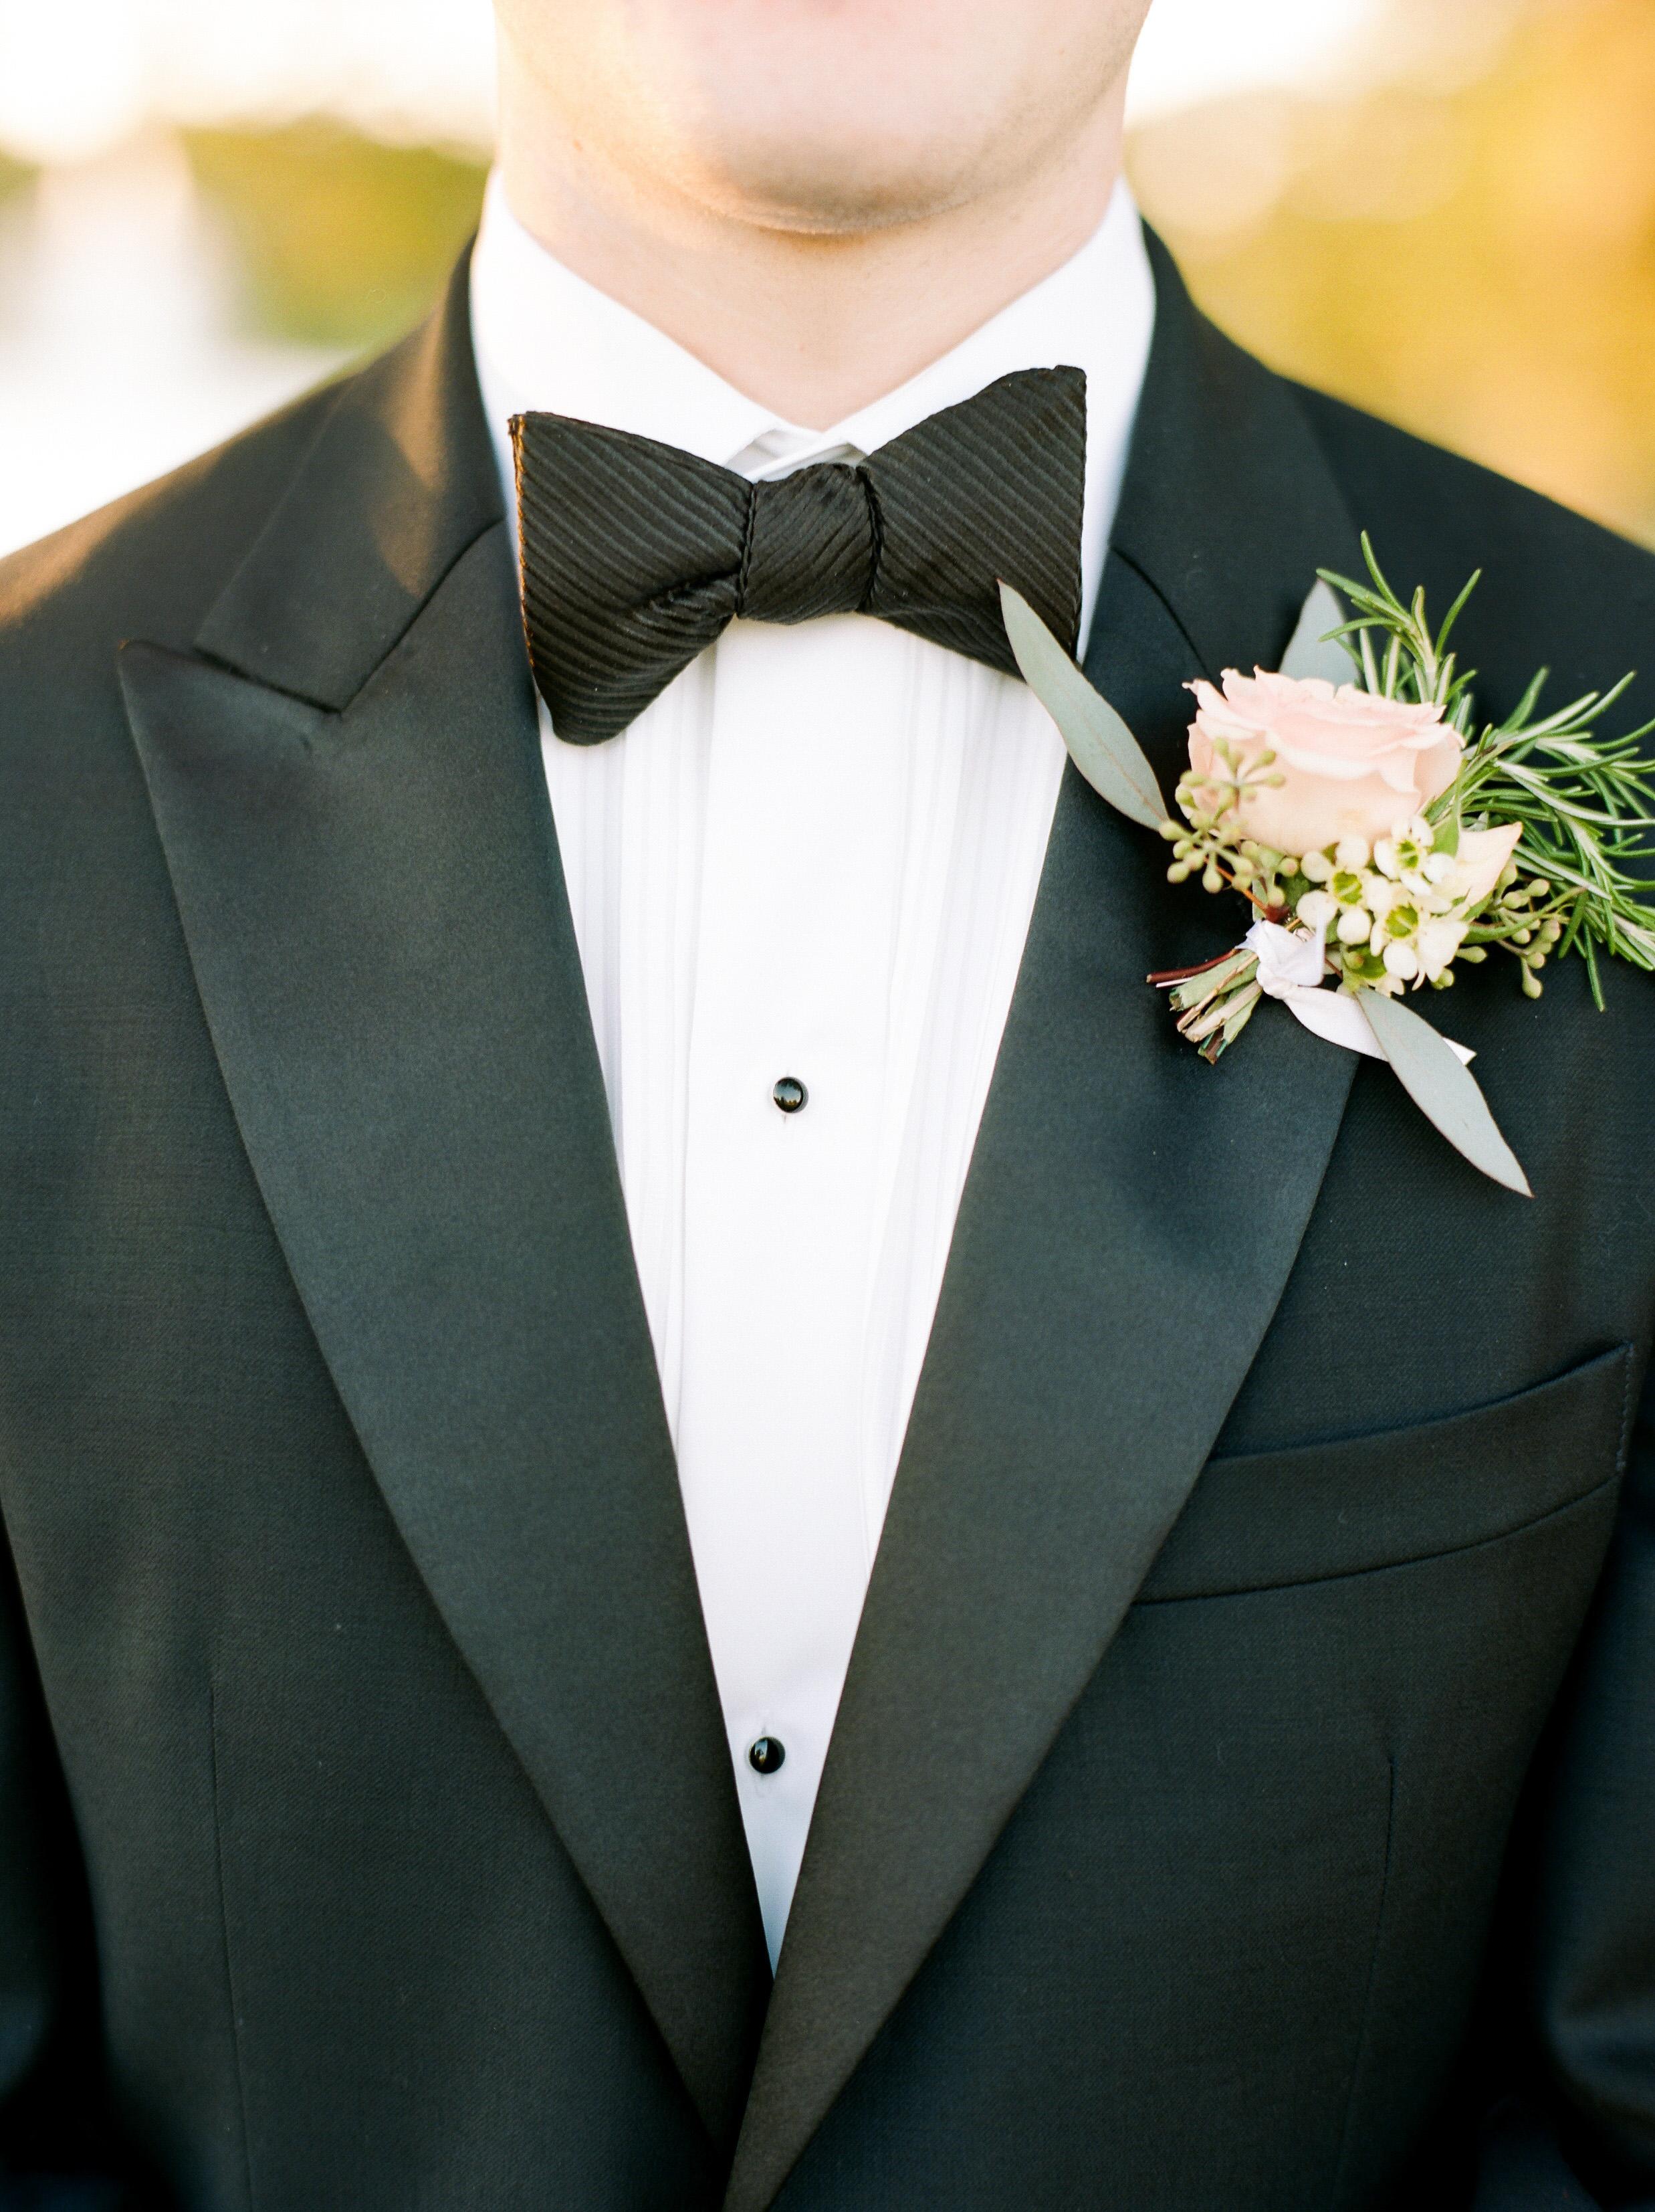 Top-Houston-Wedding-Photographer-Dana-Fernandez-Photography-The-Clubs-At-Houston-Oaks-Country-Club-Belle-Events-Film-Fine-Art-Destination-2.jpg